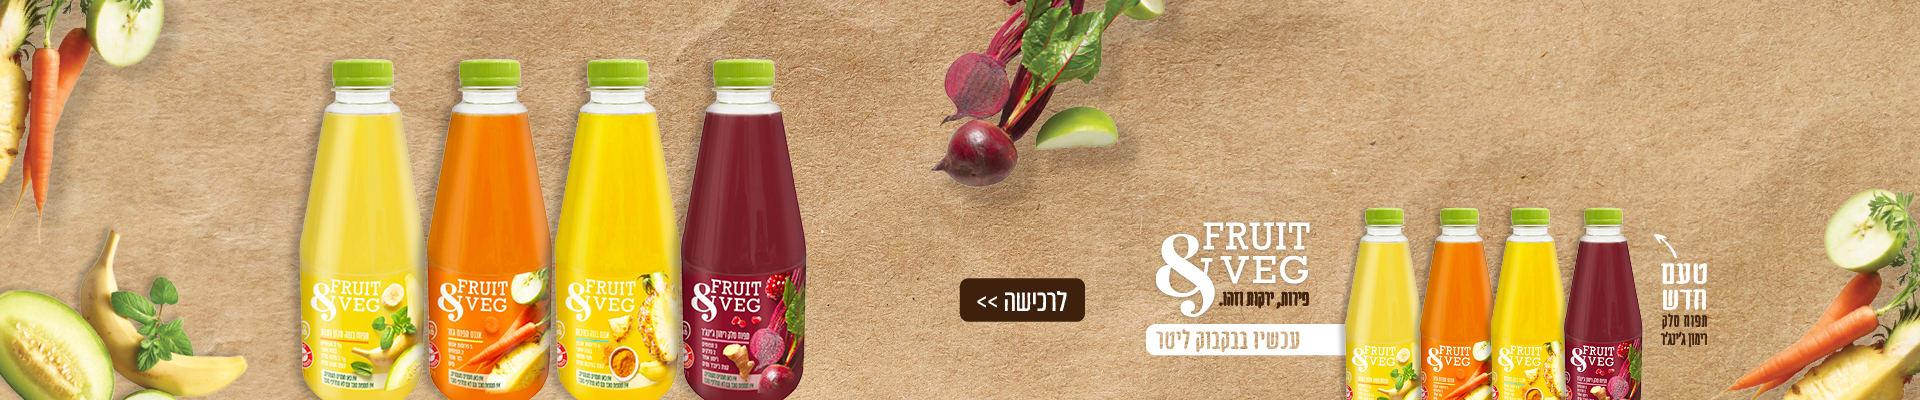 FRUIT AND VEG עכשיו בבקבוק ליטר לרכישה